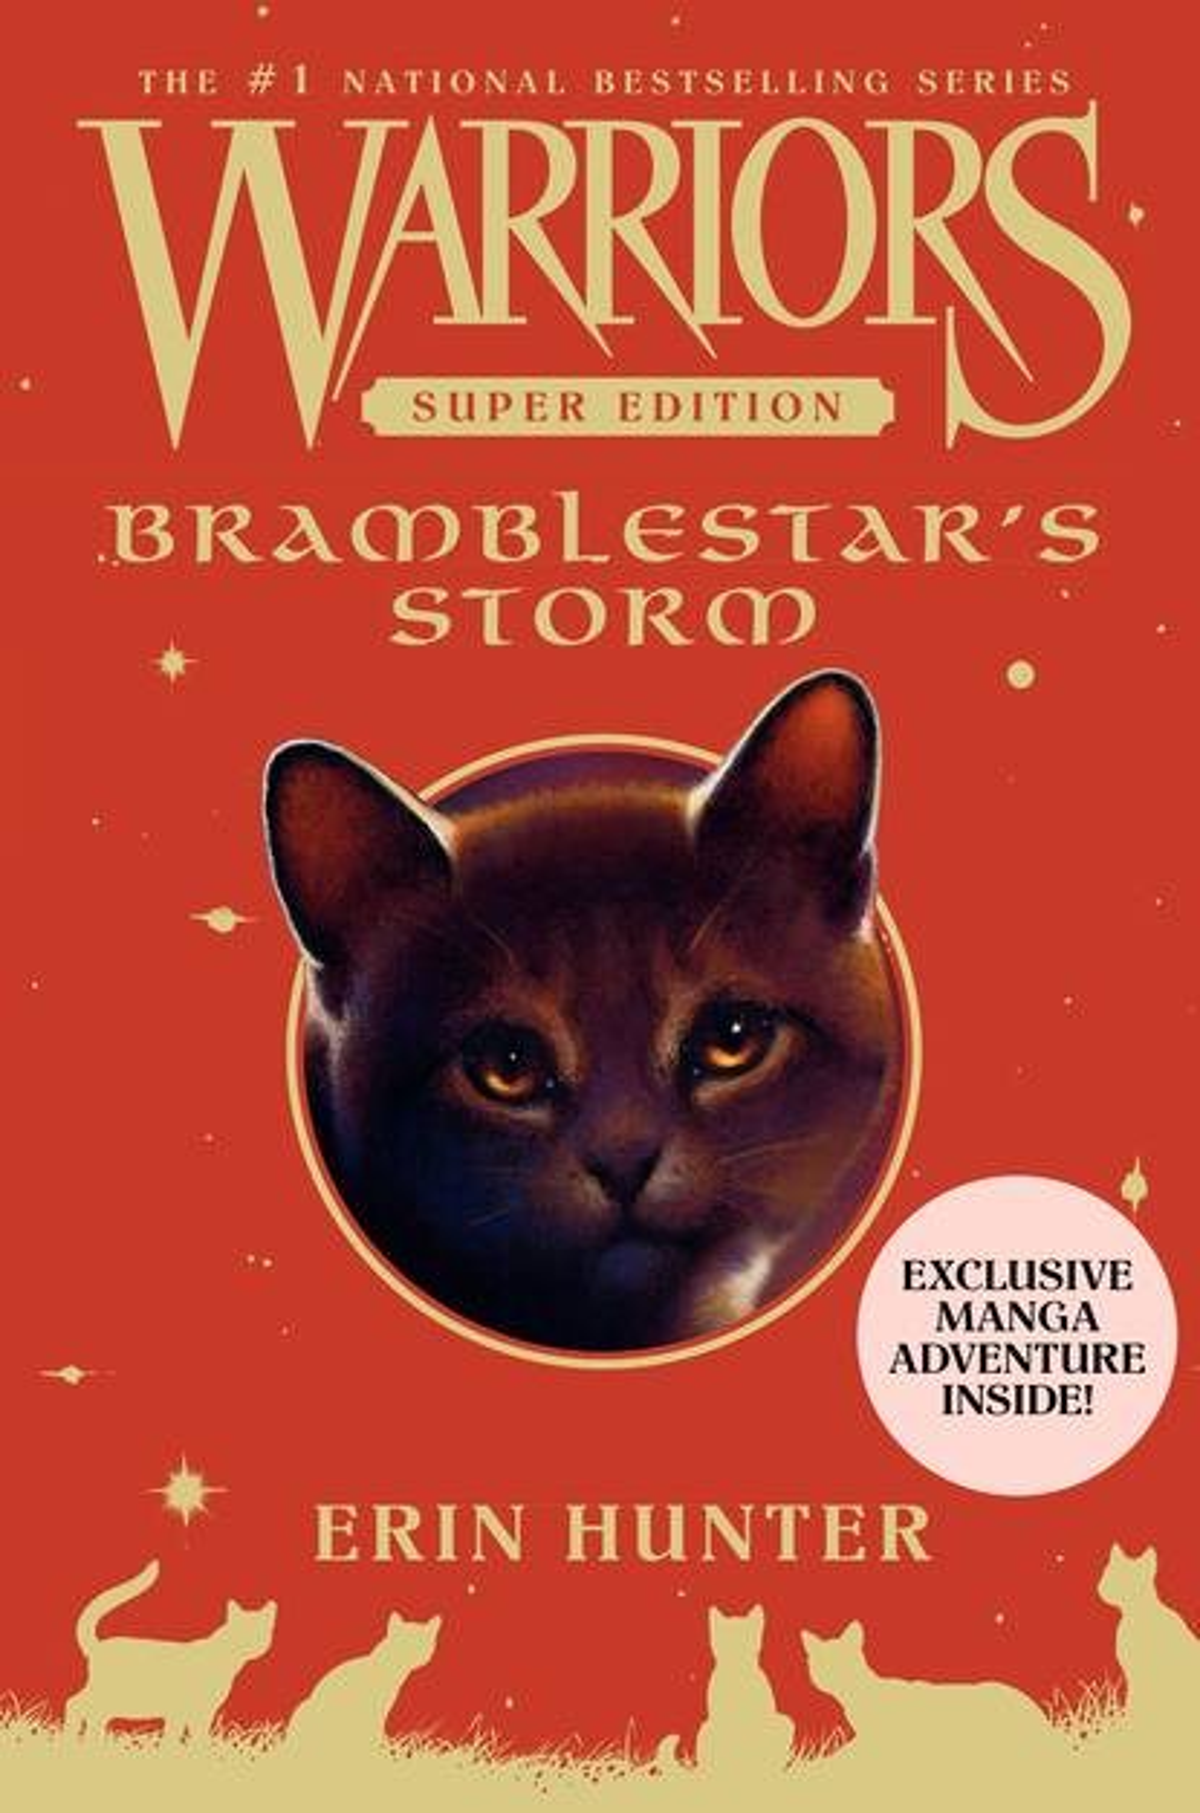 Warriors (novel series) - Wikipedia